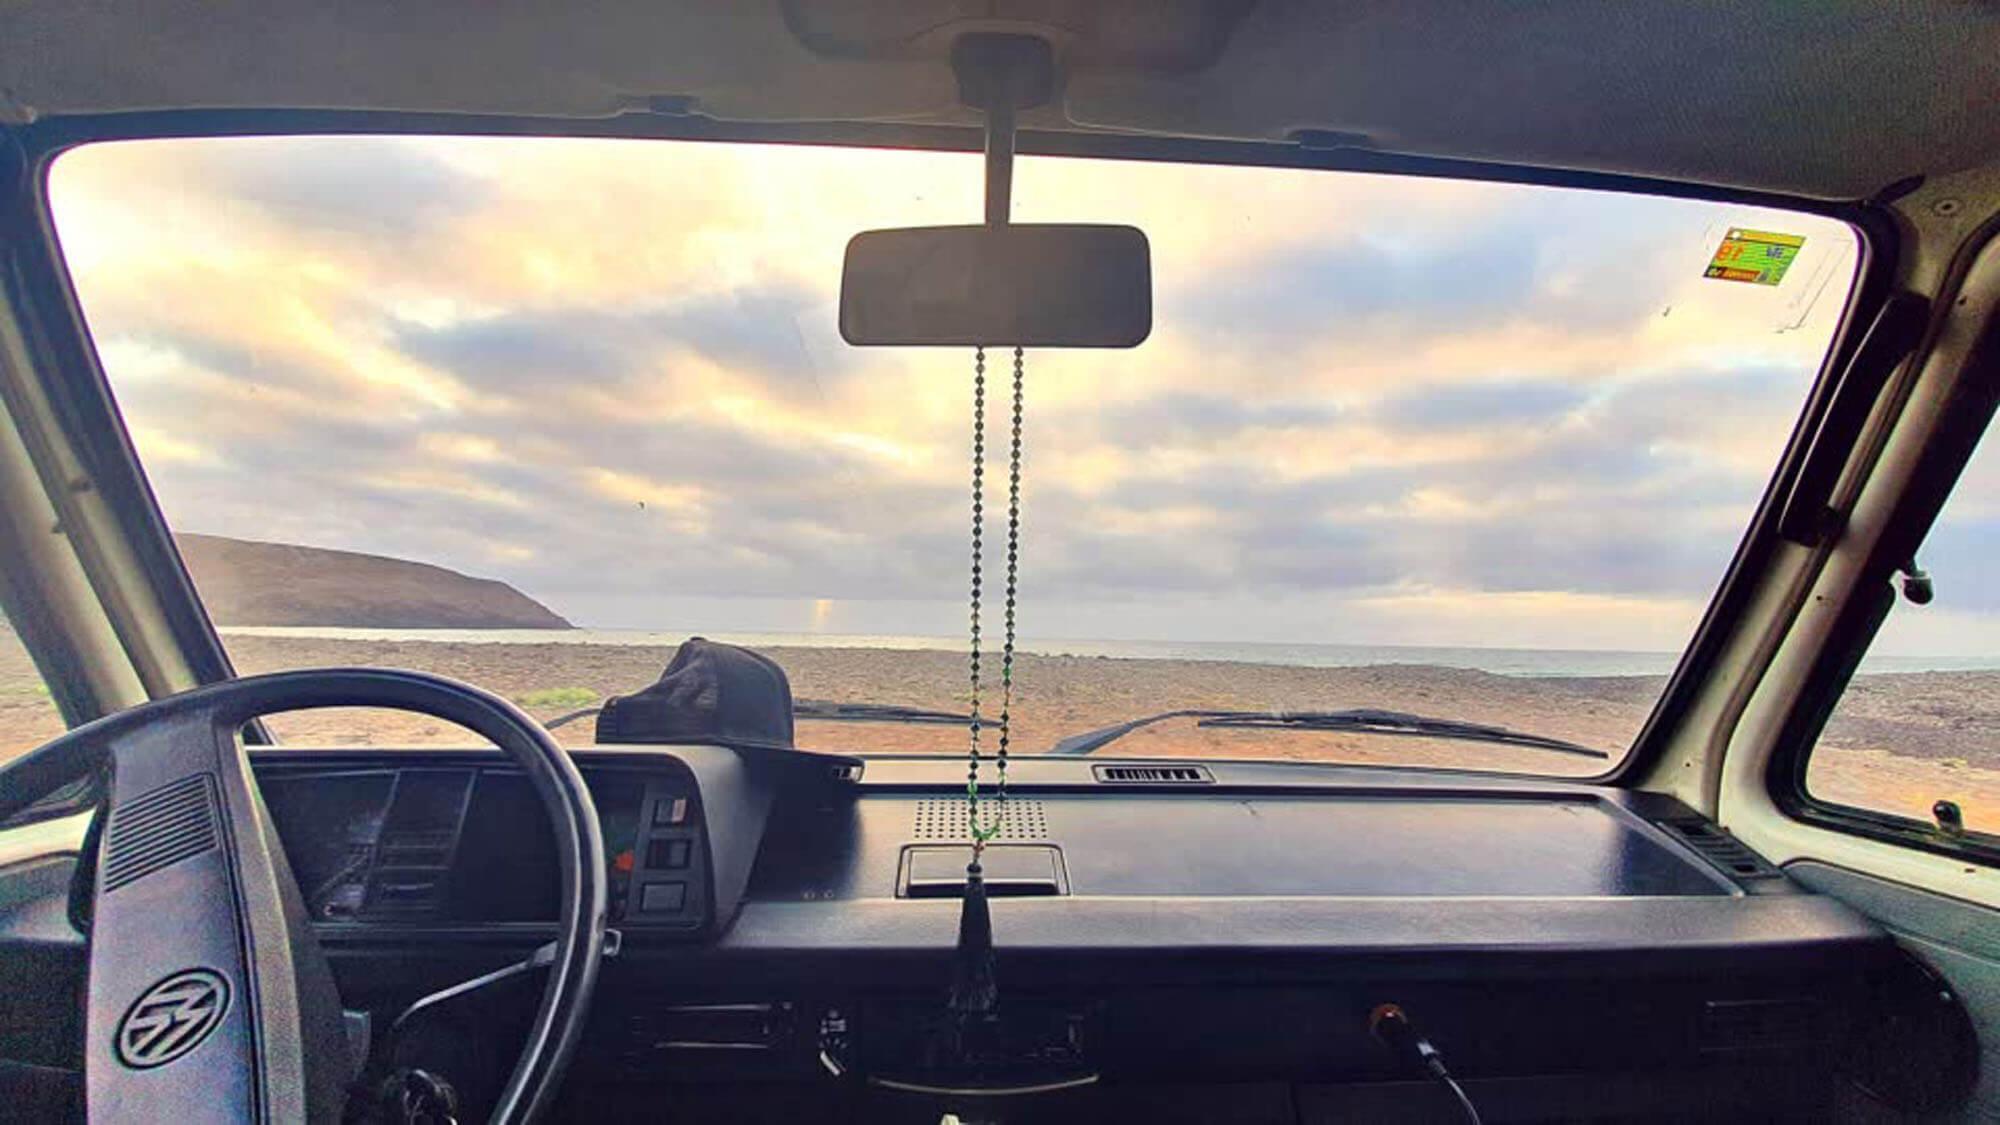 Dove sostare a Fuerteventura - Todomundoebom